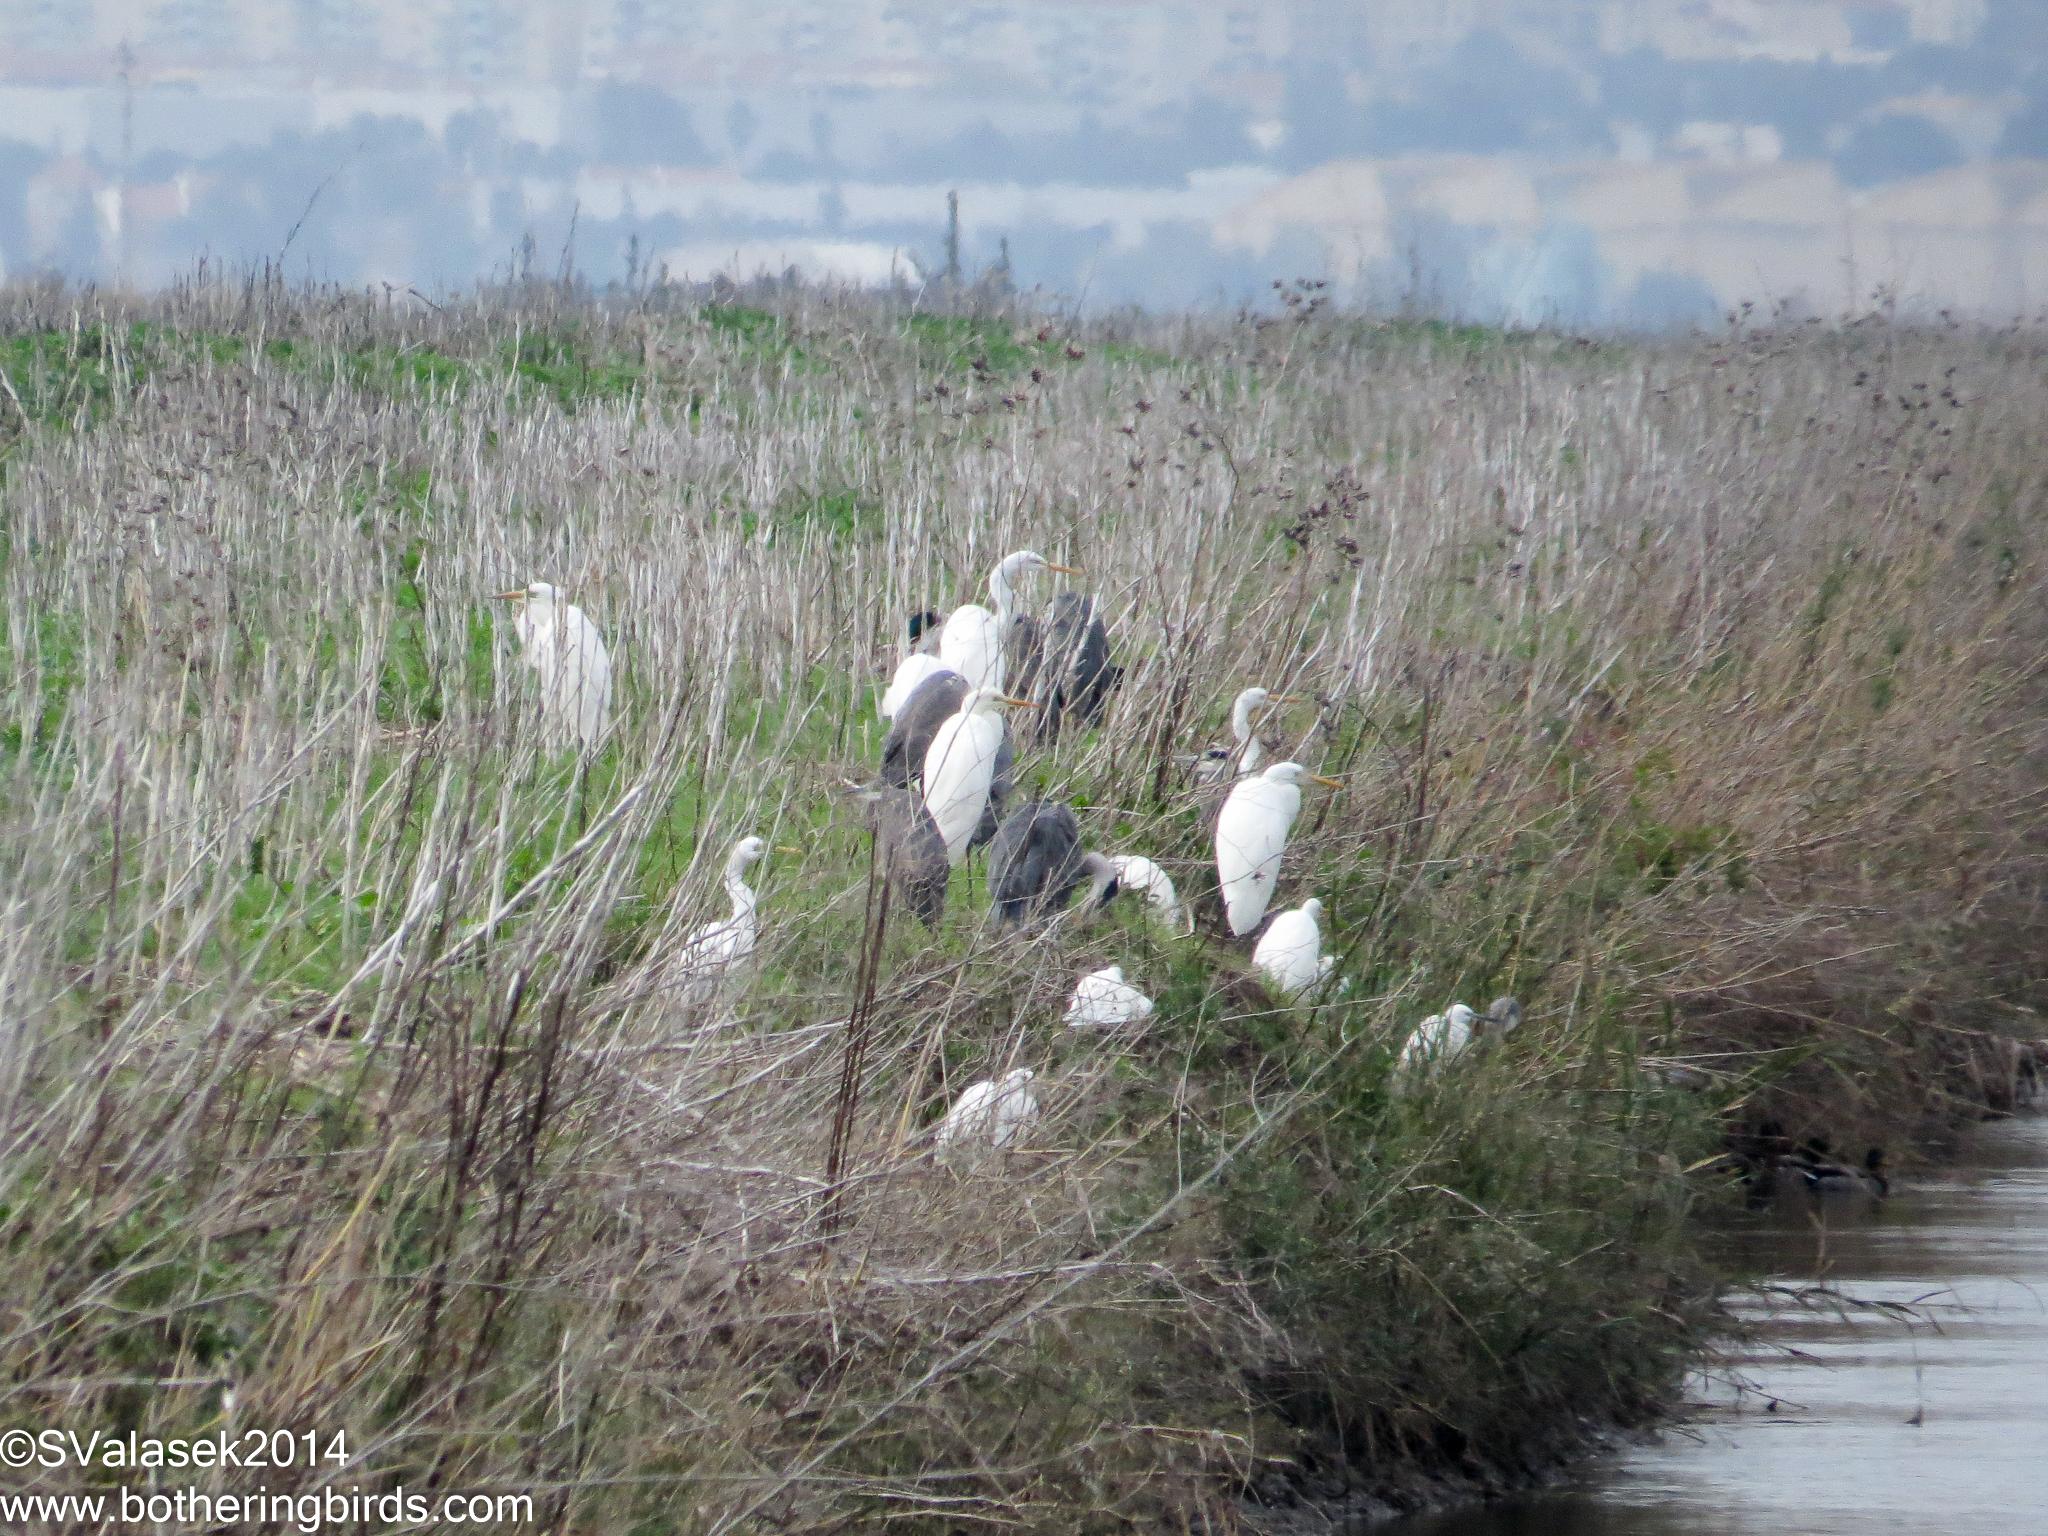 Great Egrets, Grey Heron, Cattle Egrets